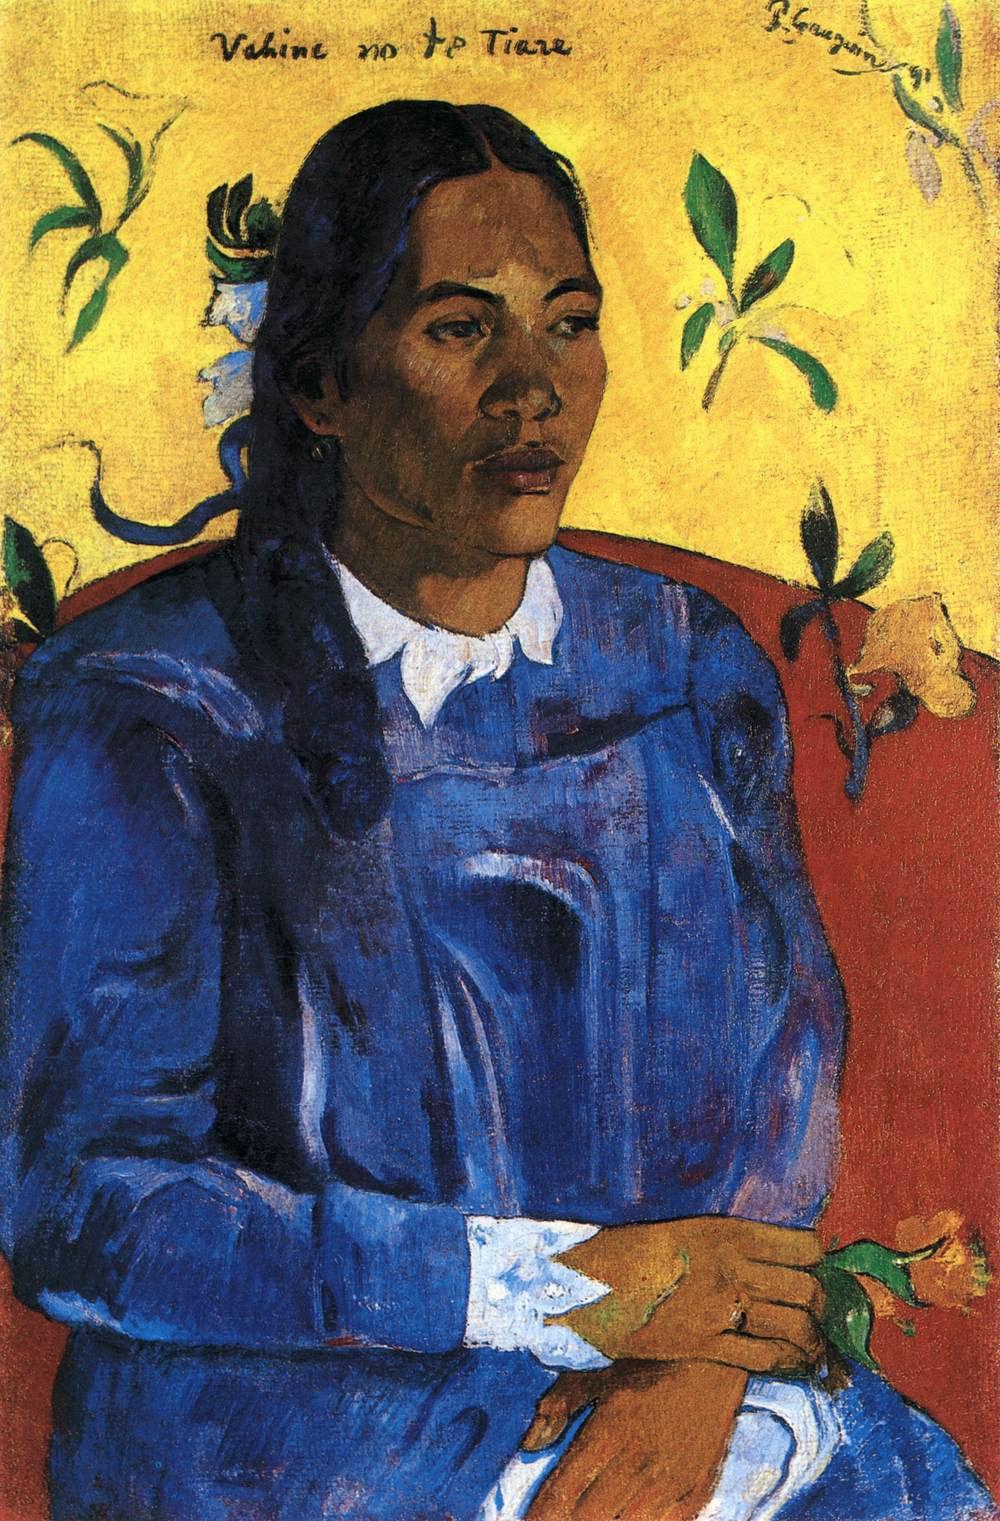 """Vahine No te Tiare (Woman With a Flower)"" (1891), Paul Gauguin, oil on canvas, 27 ½ x 18, Ny Carlsberg Glyptotek, Kopenhagen. Photo: Ole Haupt."